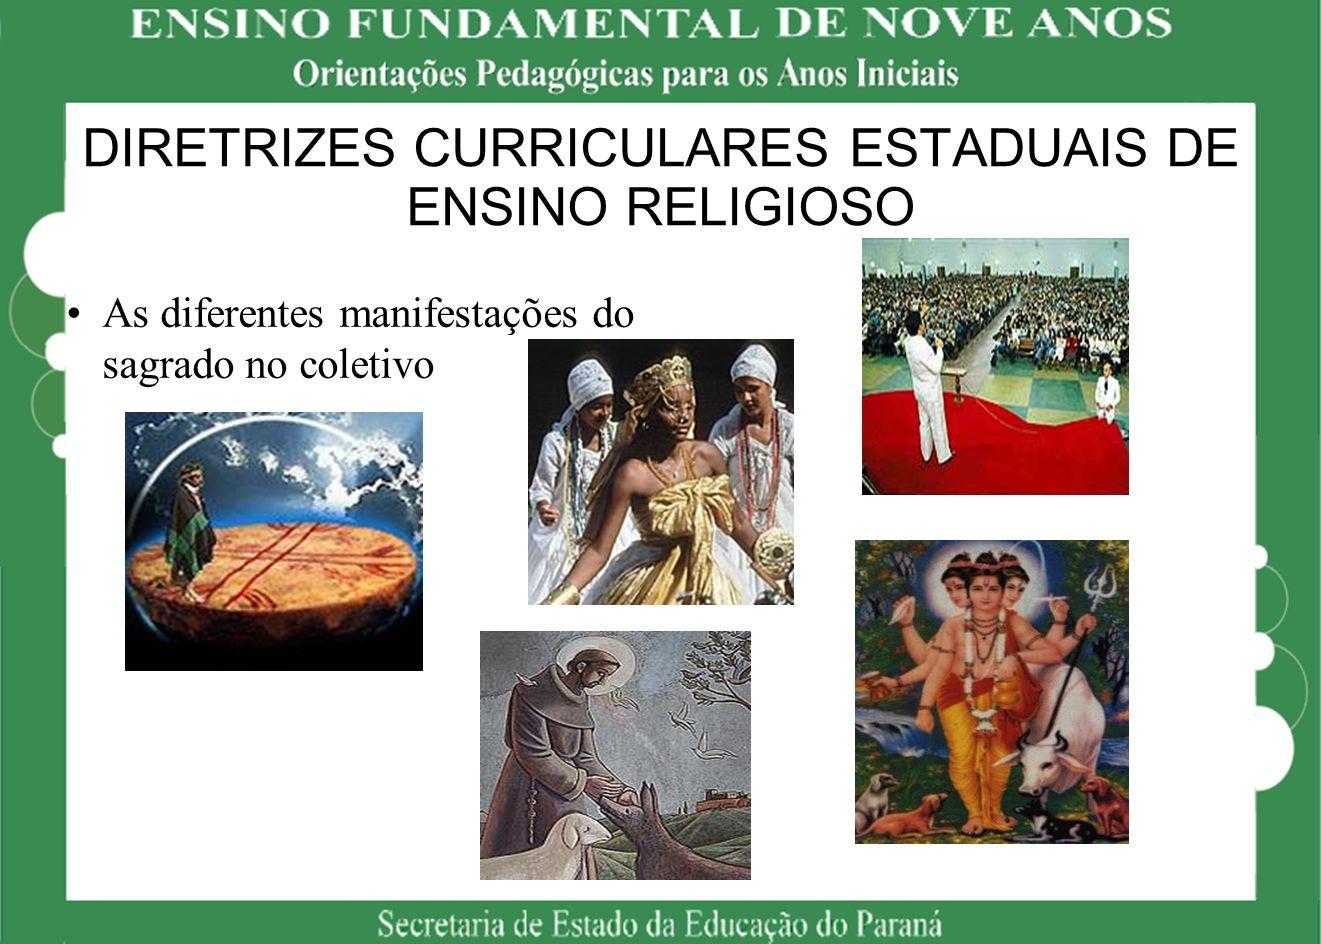 DIRETRIZES CURRICULARES ESTADUAIS DE ENSINO RELIGIOSO